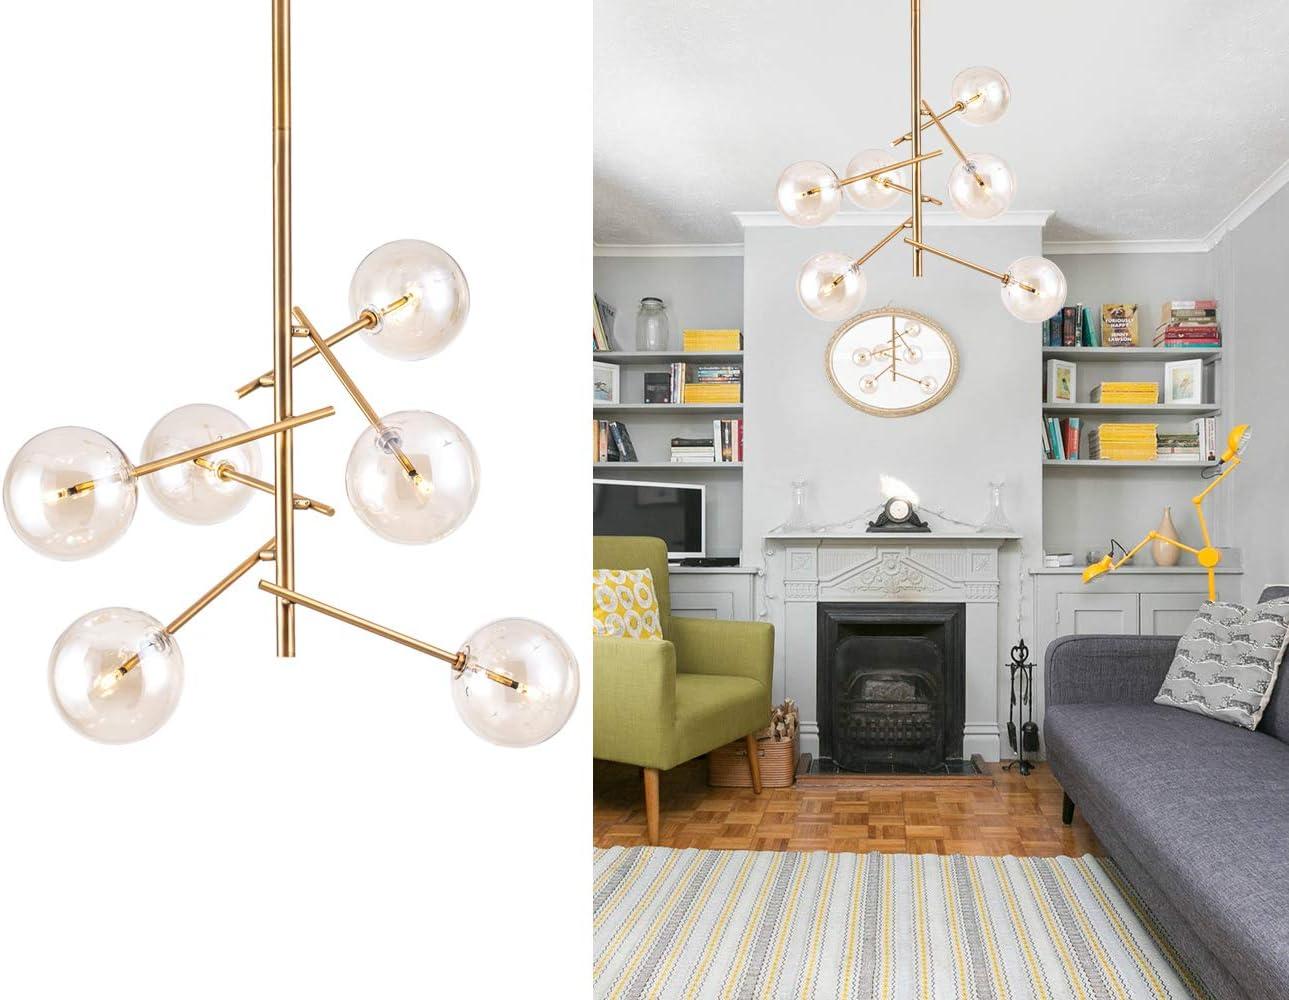 Amazon Com Modern Sputnik Chandelier 6 Lights Mid Century Brass Vintage Pendant Lighting Fixture For Foyer Dining Living Room Bedroom By Bewamf Home Improvement